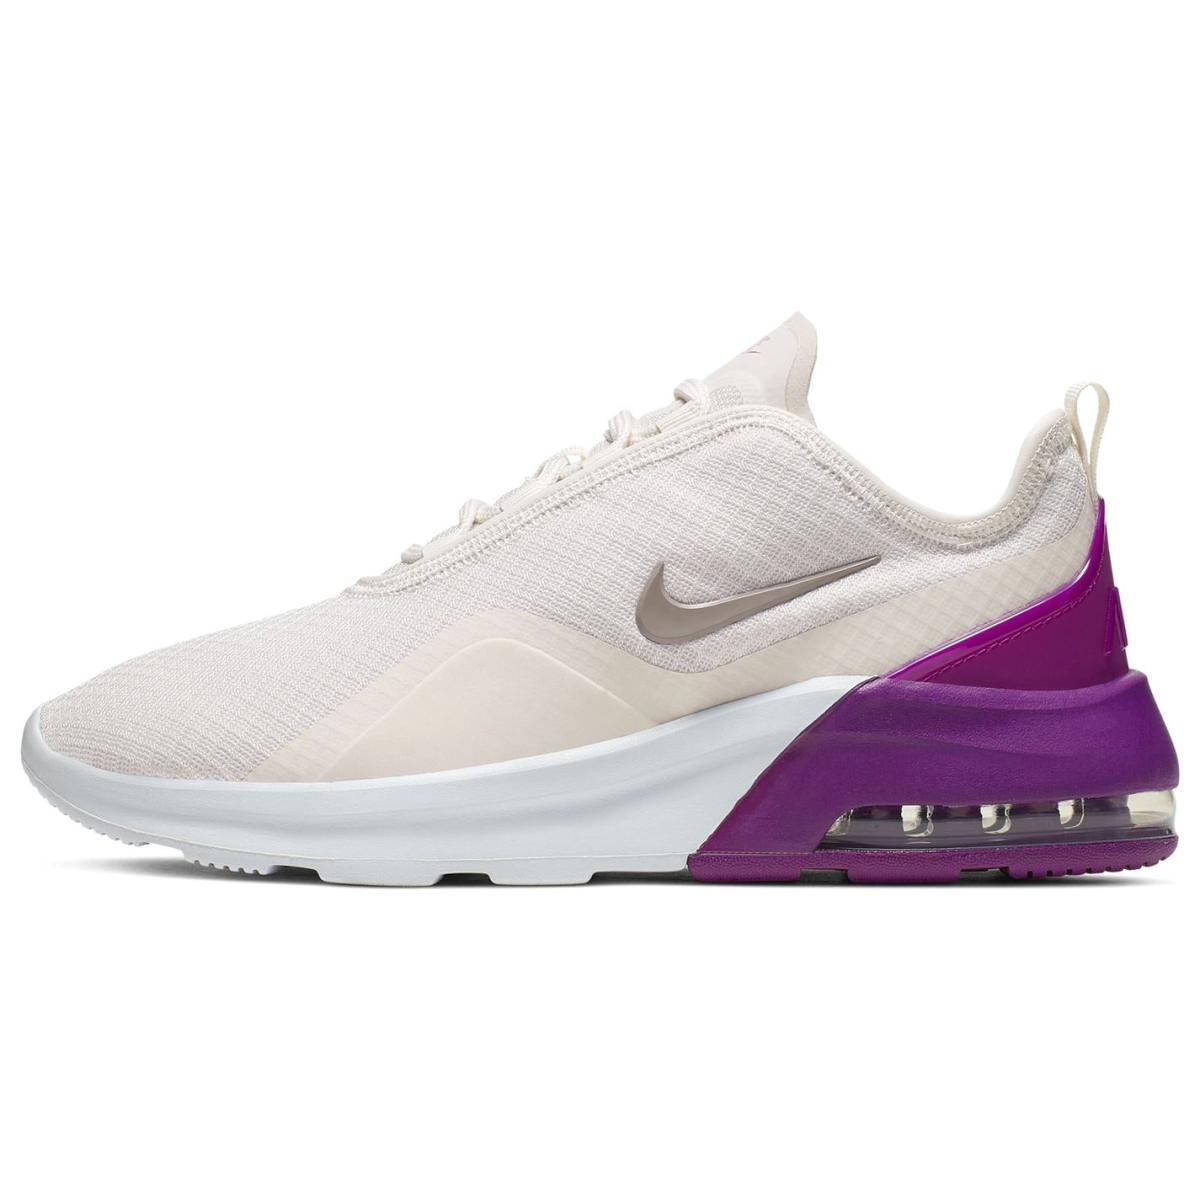 Nike-Air-Max-Motion-2-Turnschuhe-Damen-Sneaker-Sportschuhe-Laufschuhe-4024 Indexbild 11